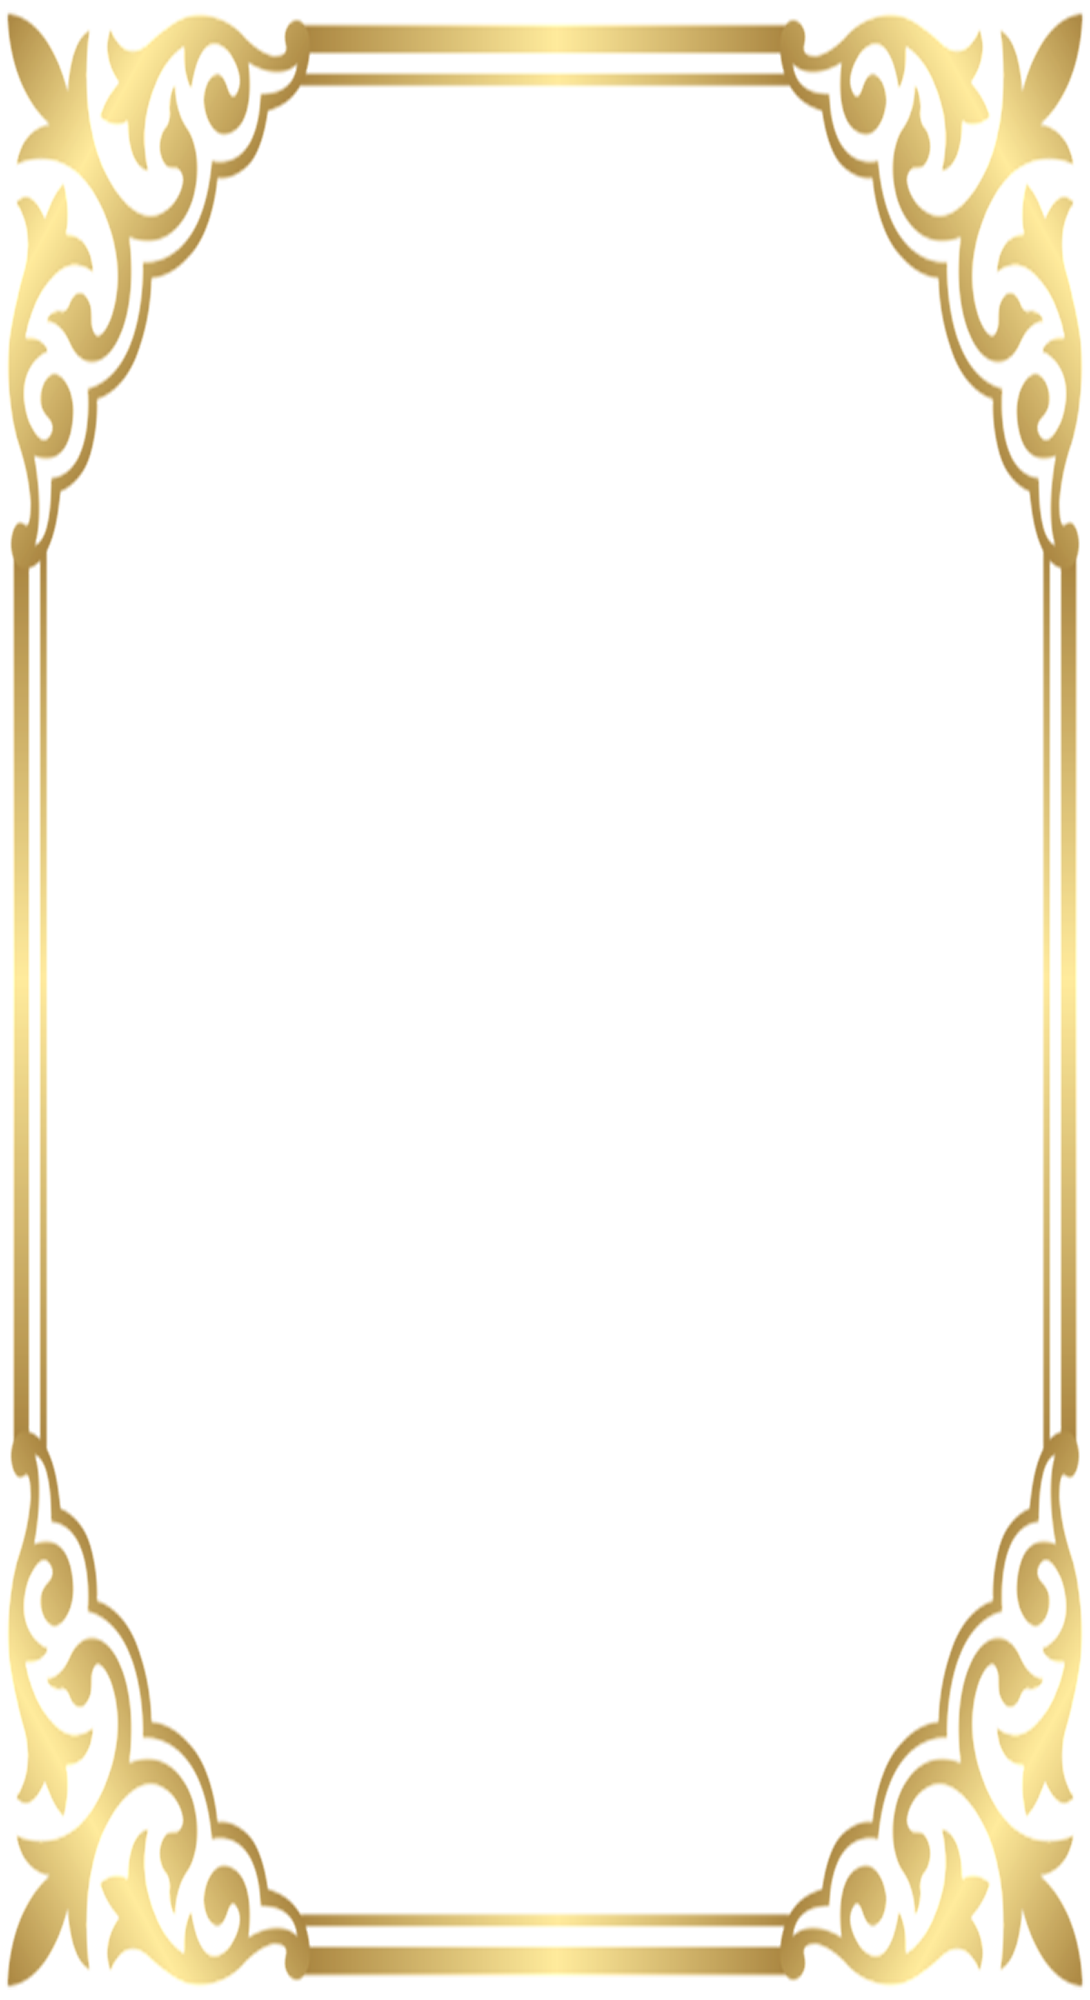 Pin By Angềlique La Mส Rguisề On Ramochki Clip Art Art Images Free Clip Art